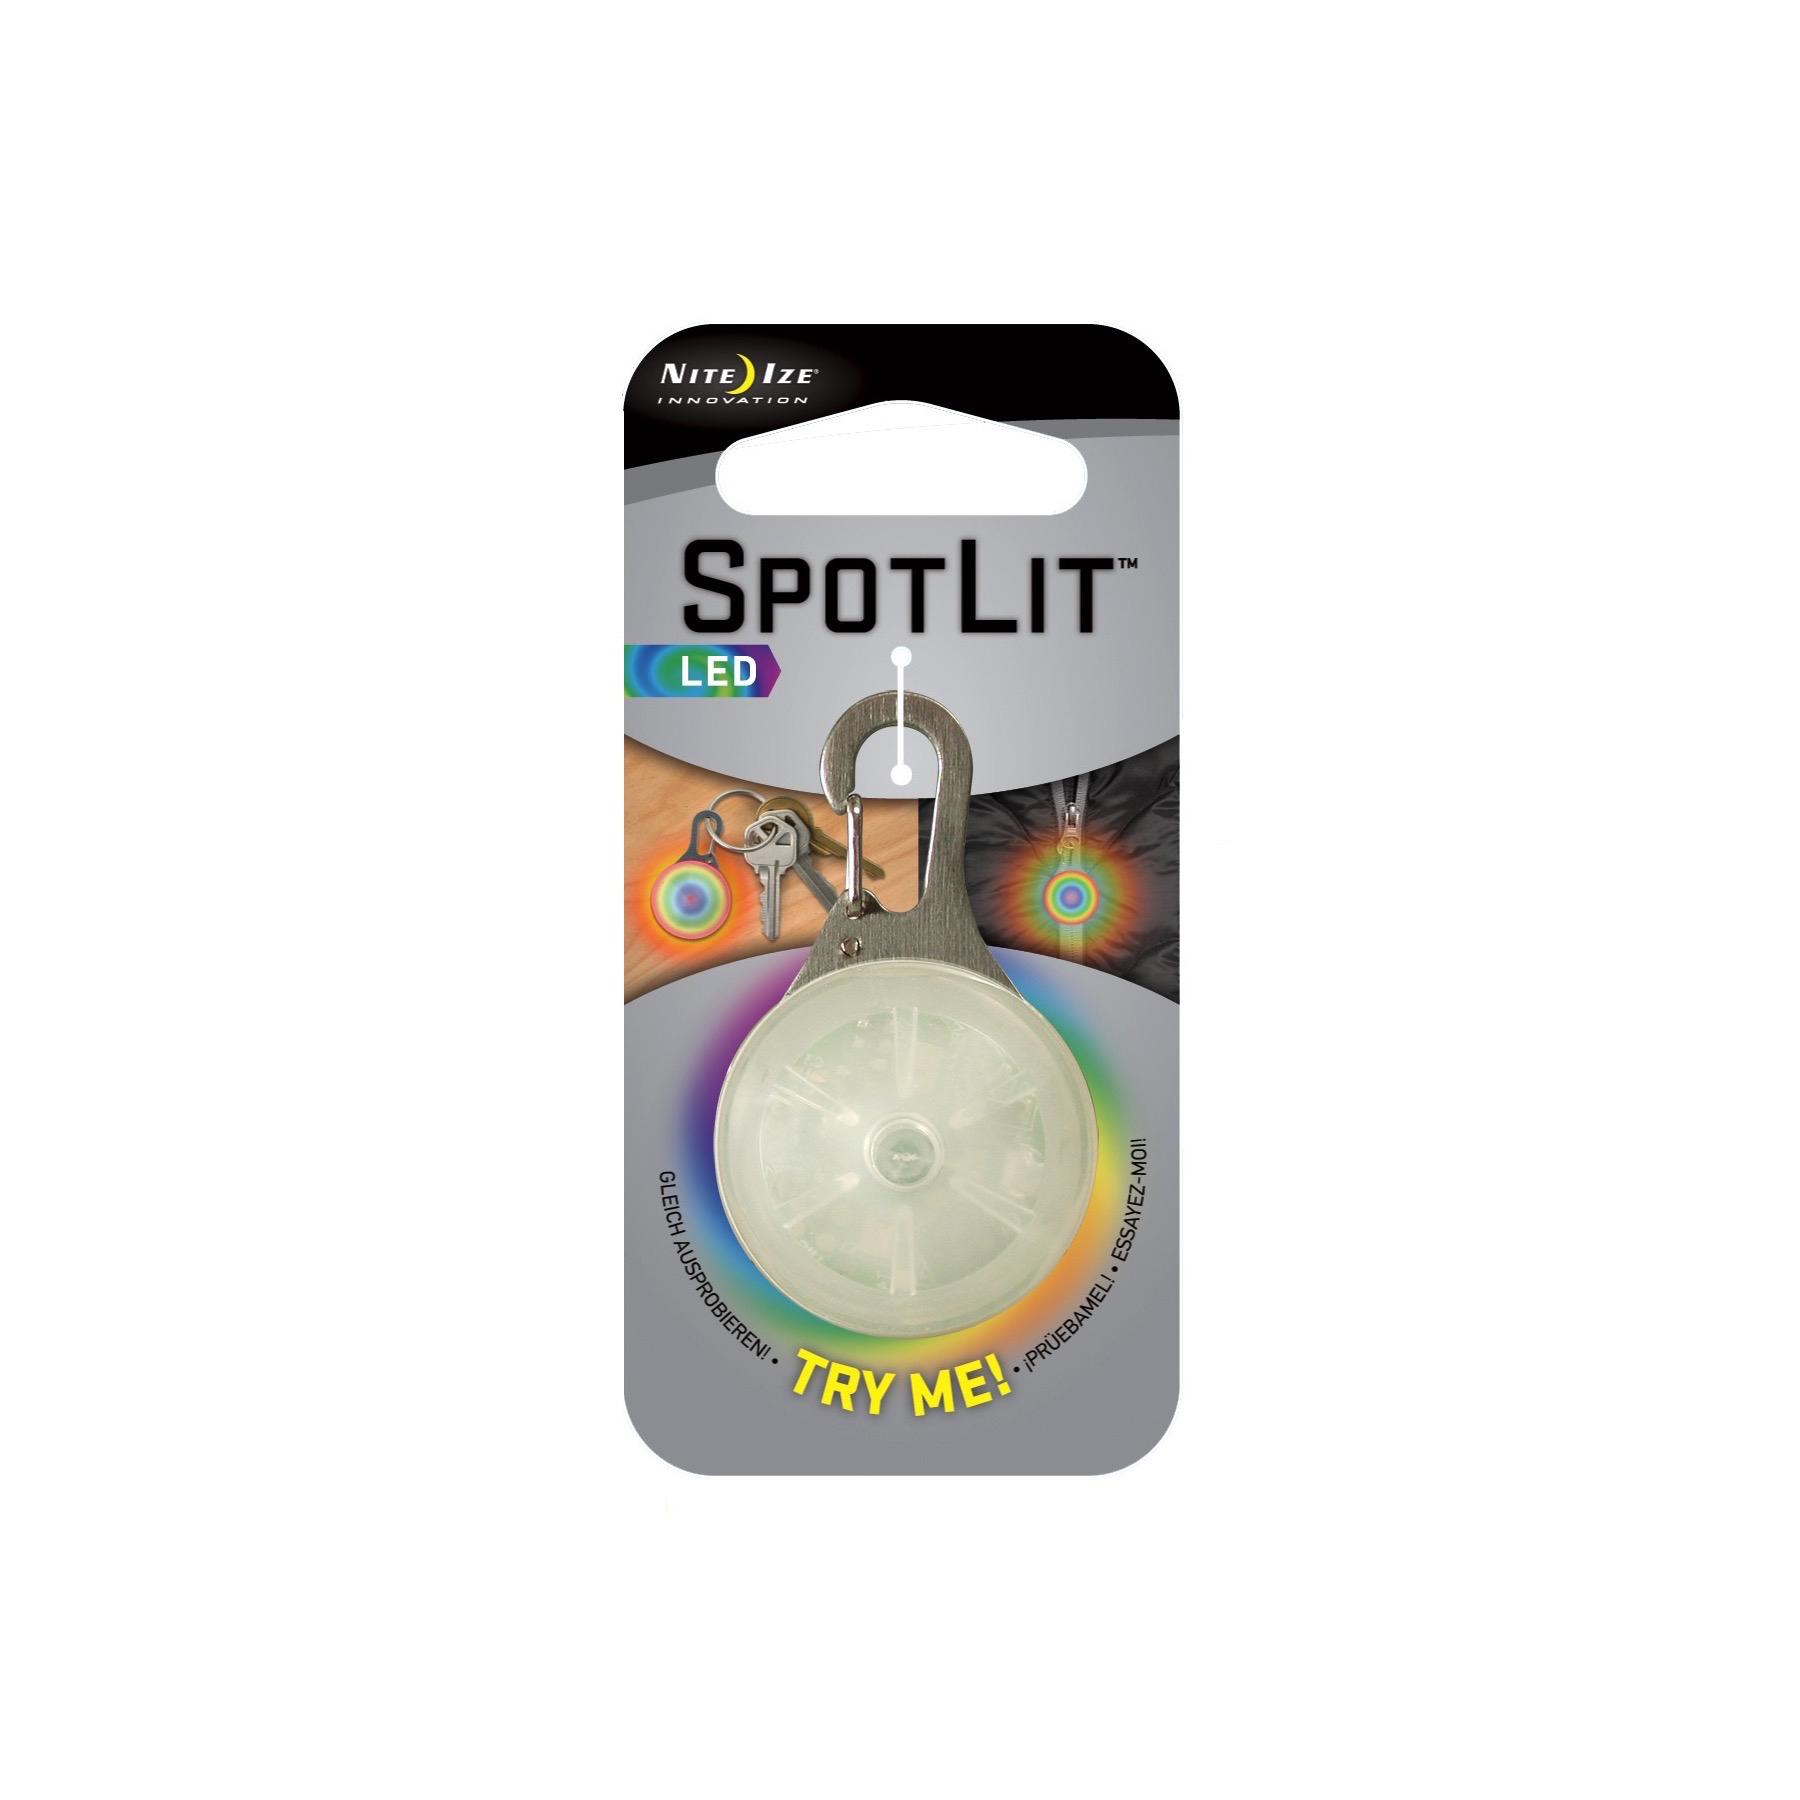 Nite Ize SpotLit LED Carabiner Light Disco Mini Keychain Collar Safety 6-Pack